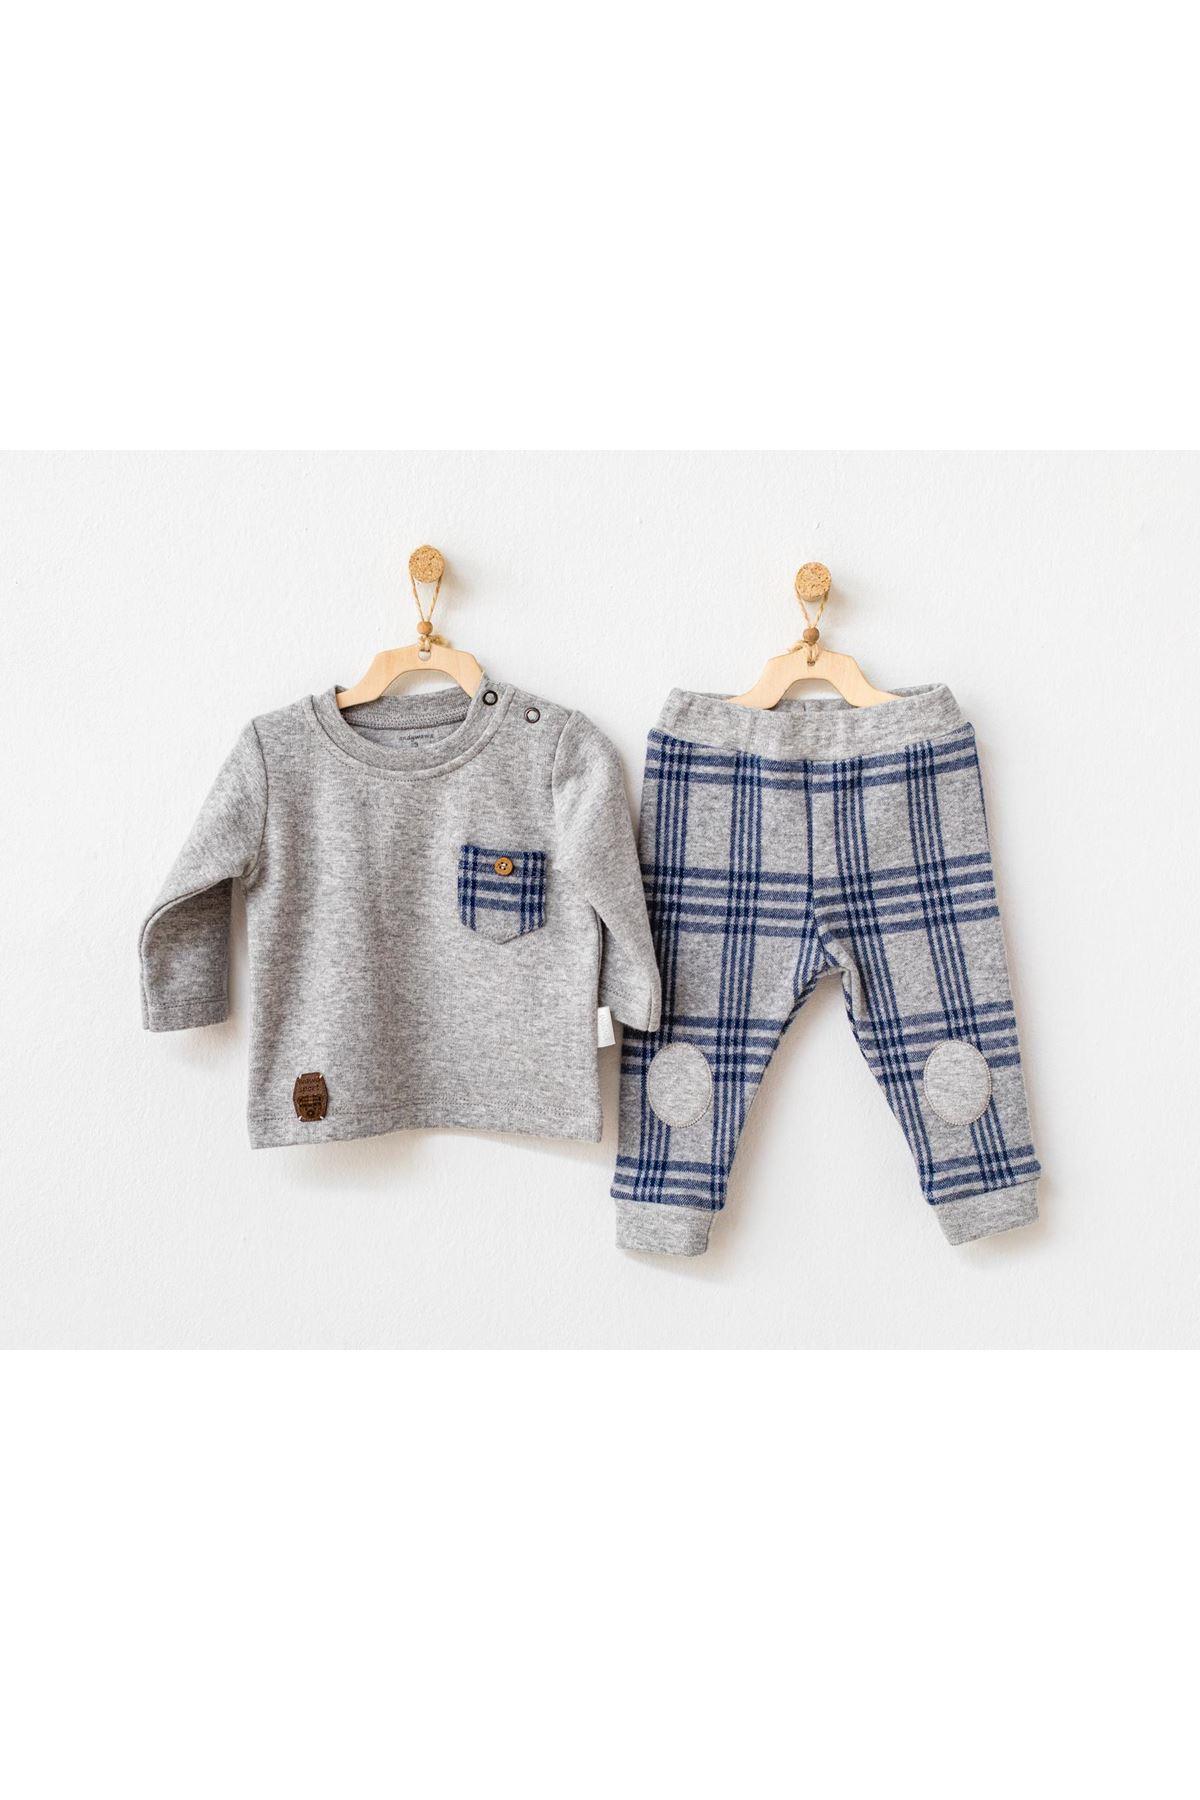 Andywawa AC21154 Awesome 2li Bebek Takım Grey Melange